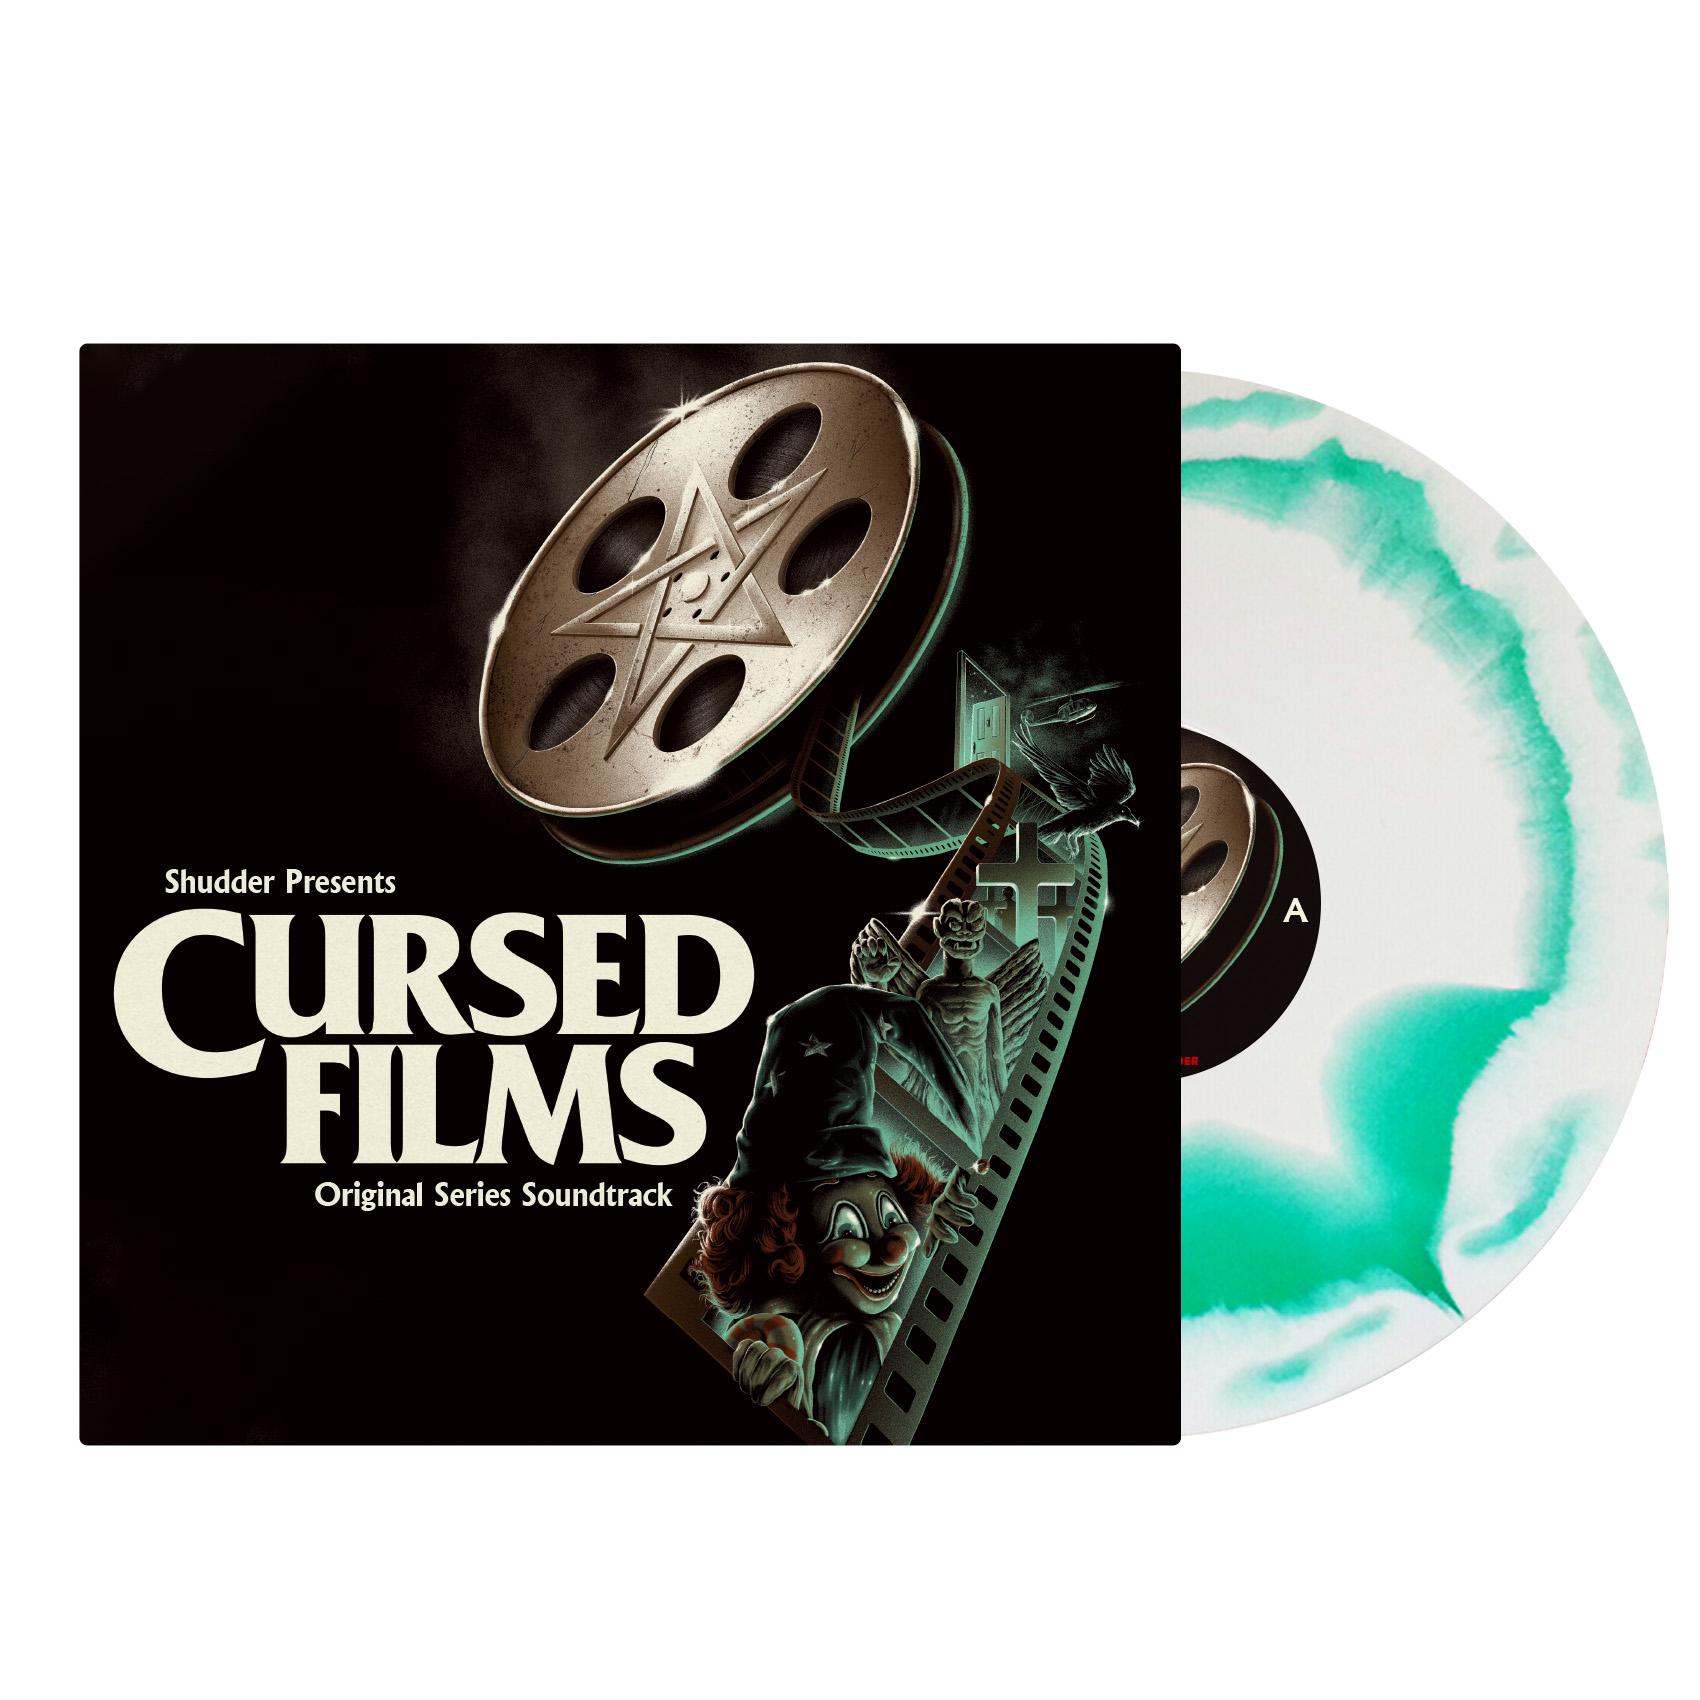 Cursed Films (Original Series Soundtrack)